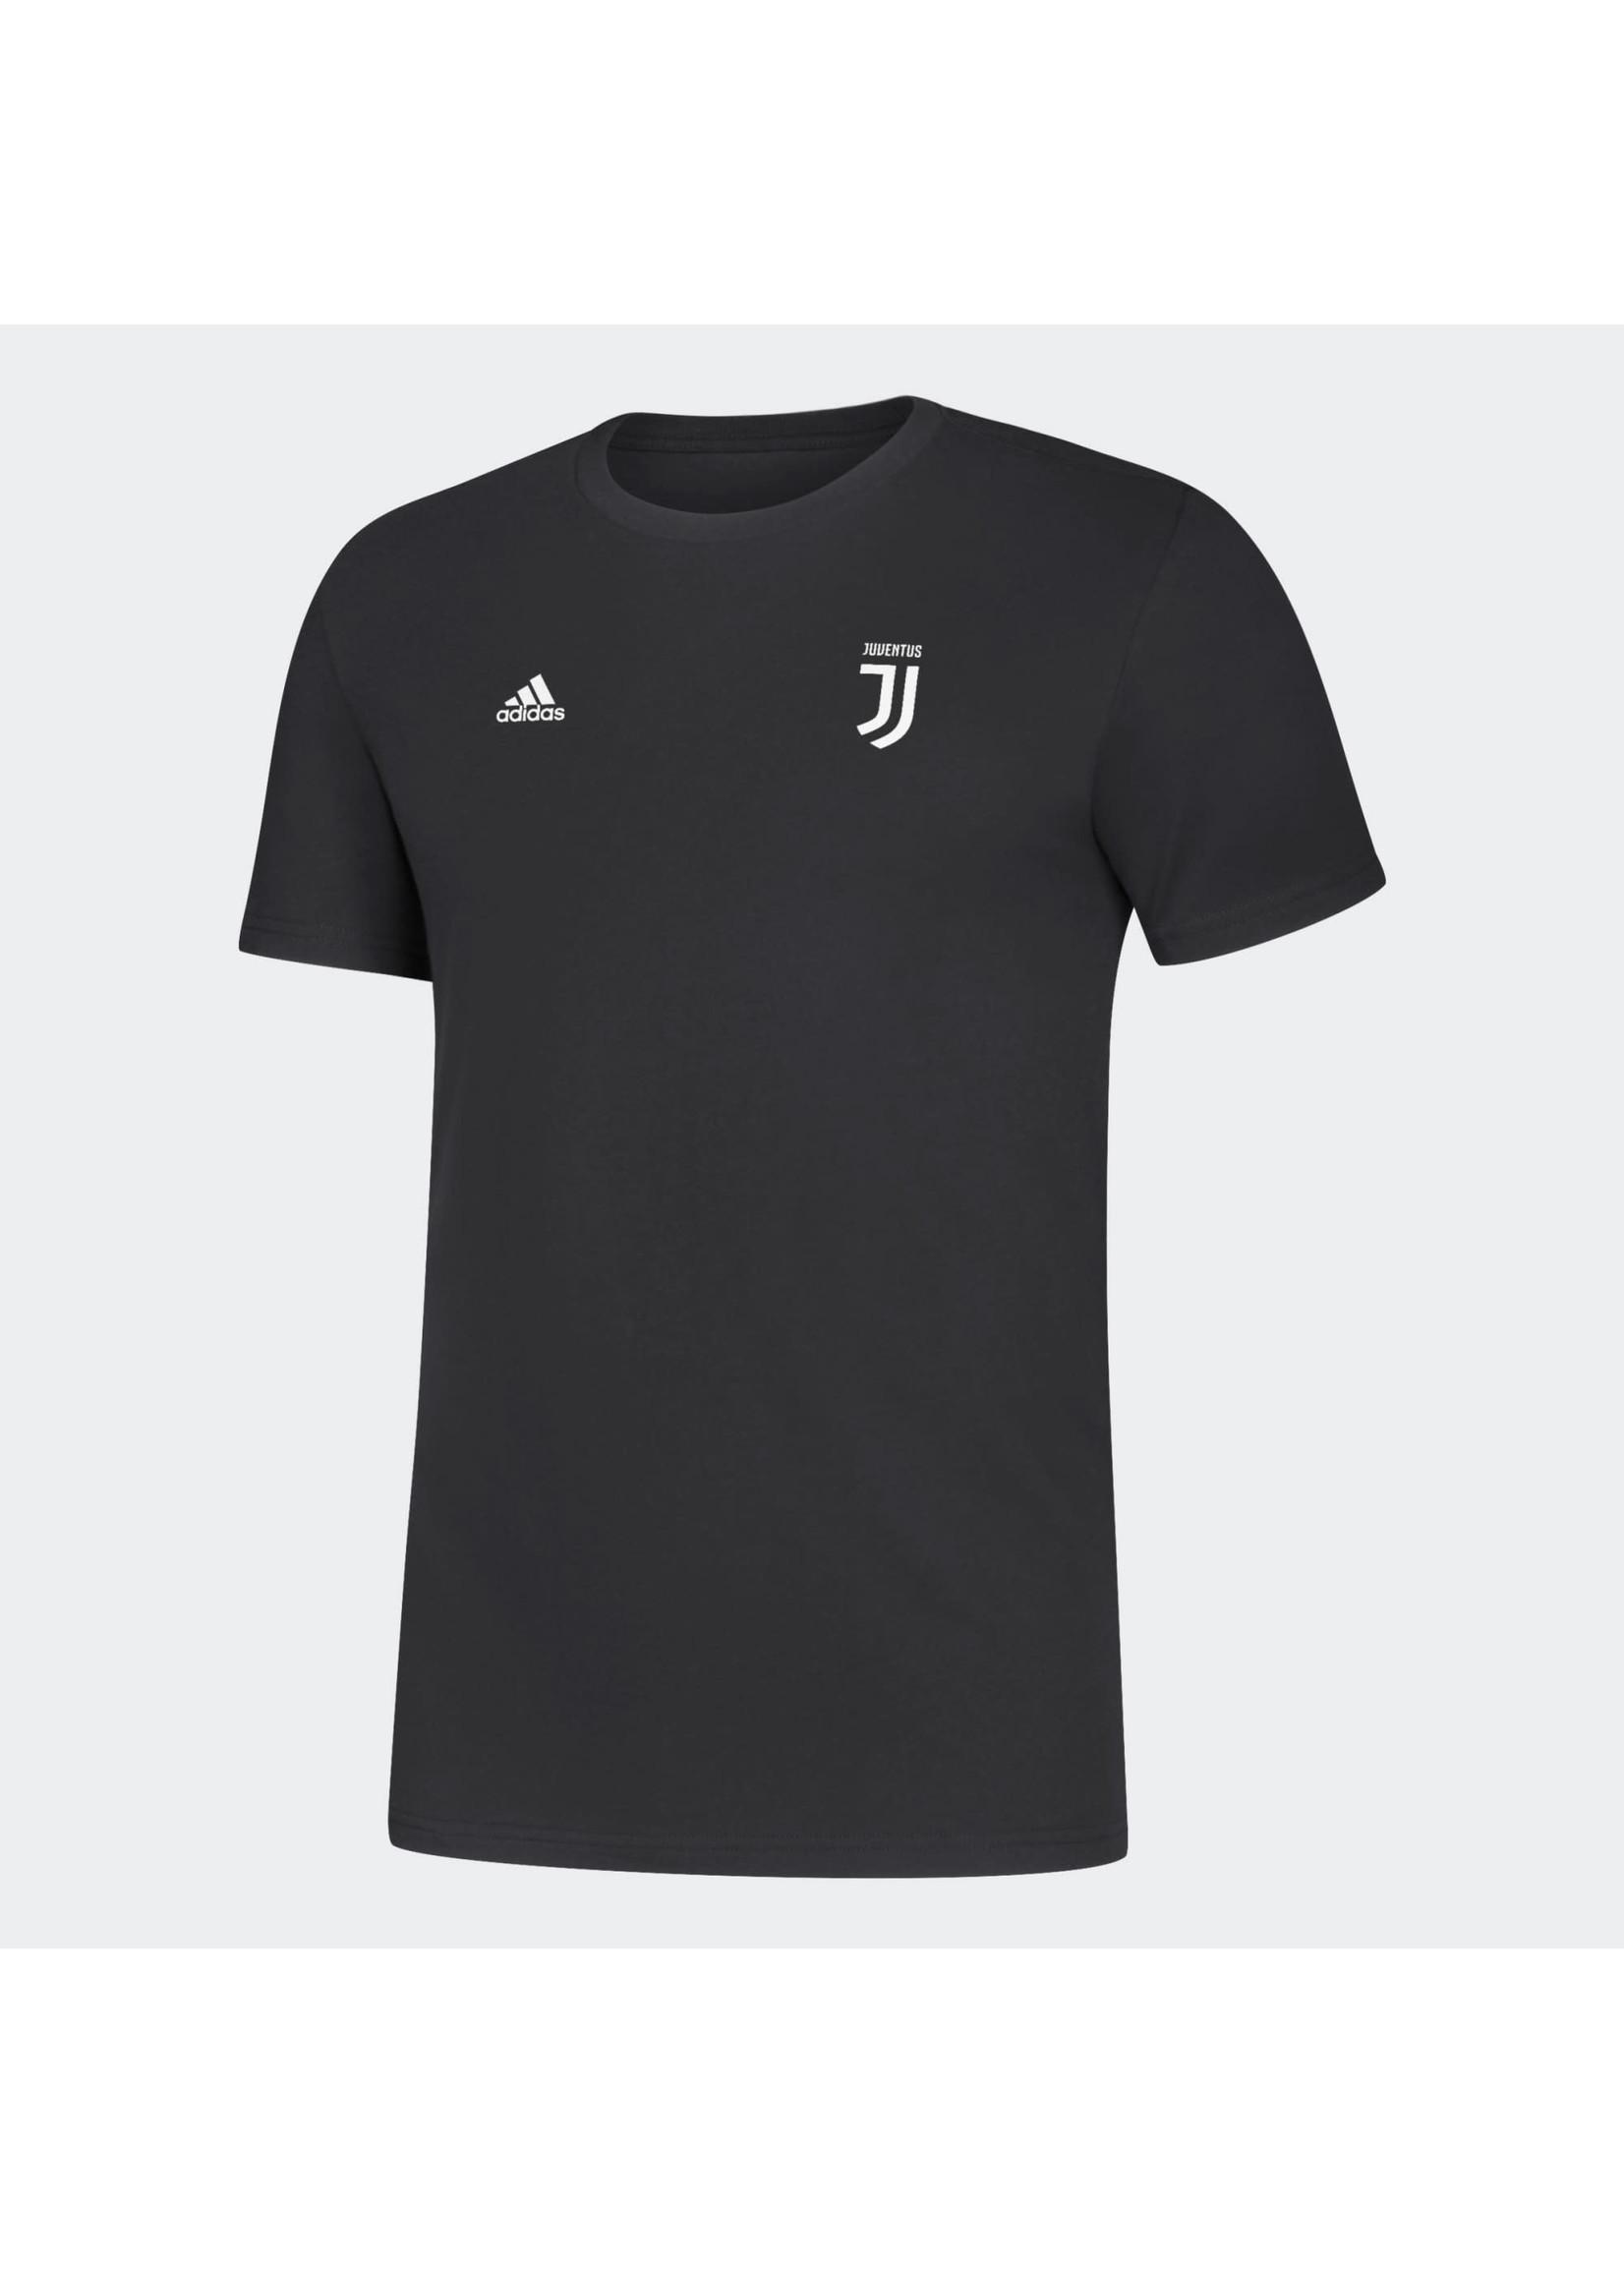 Adidas Juventus T-Shirt - Ronaldo